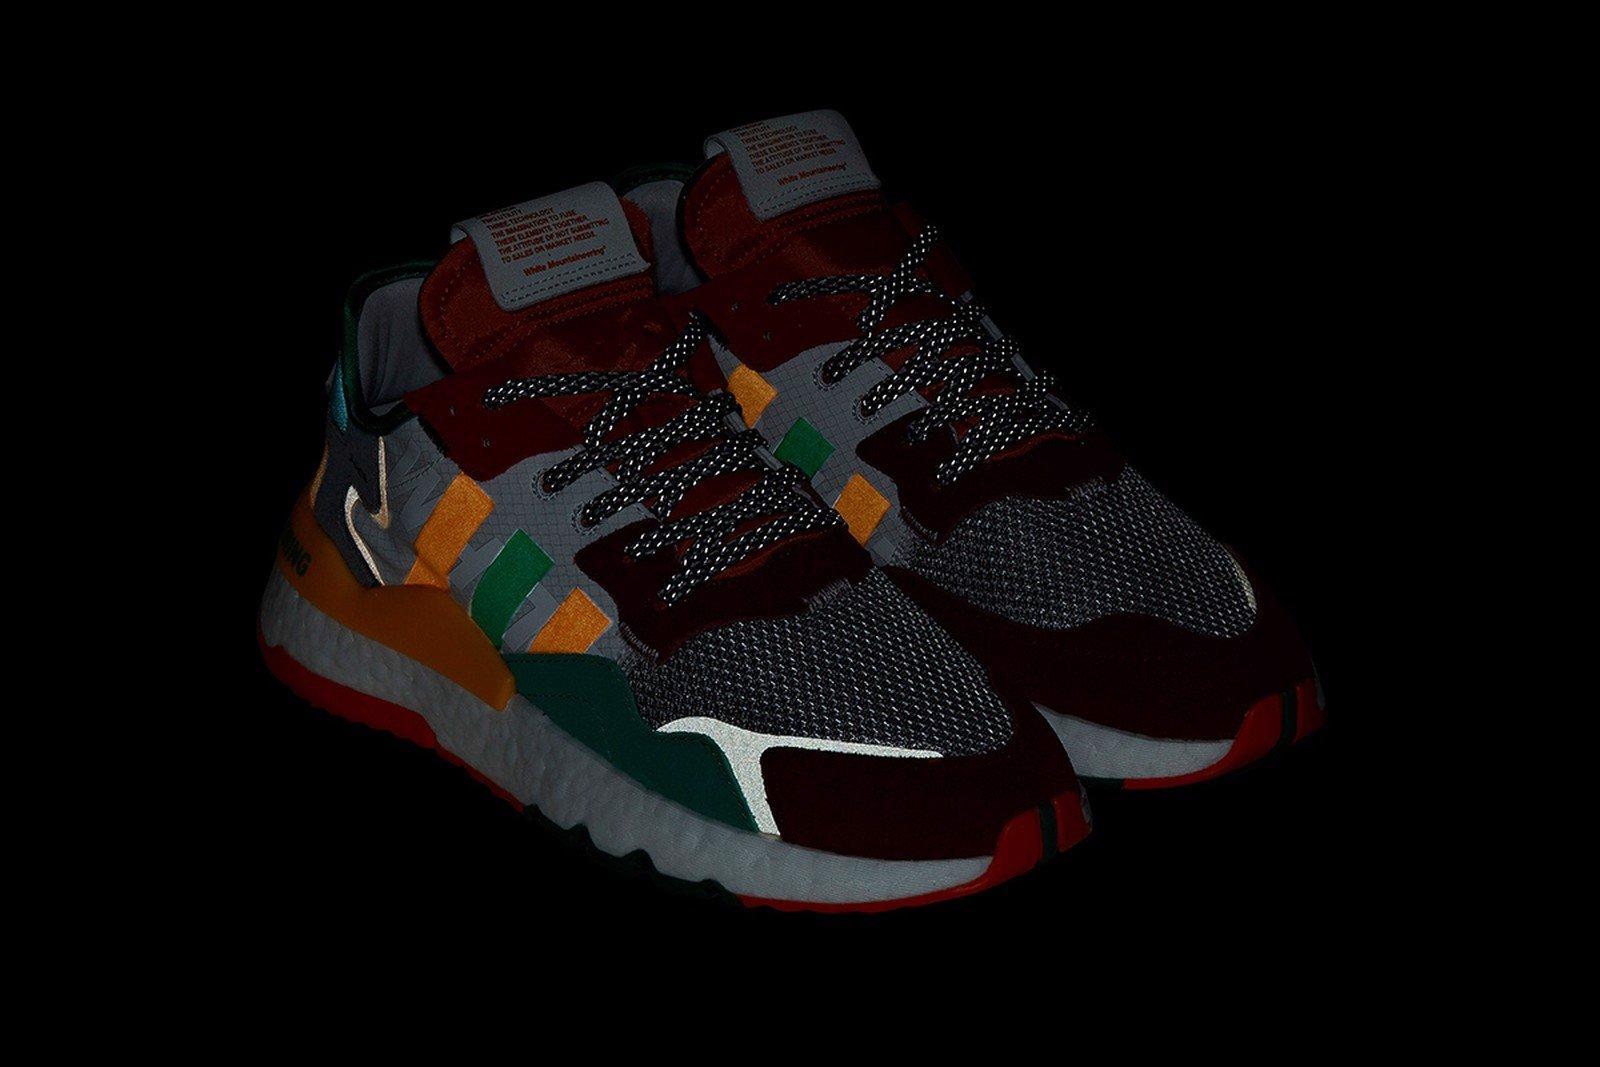 https://authentic-shoes.com/blogs/news/adidas-x-mountaineering-cho-ra-phoi-mau-cuc-dep-thuoc-dong-nite-jogger